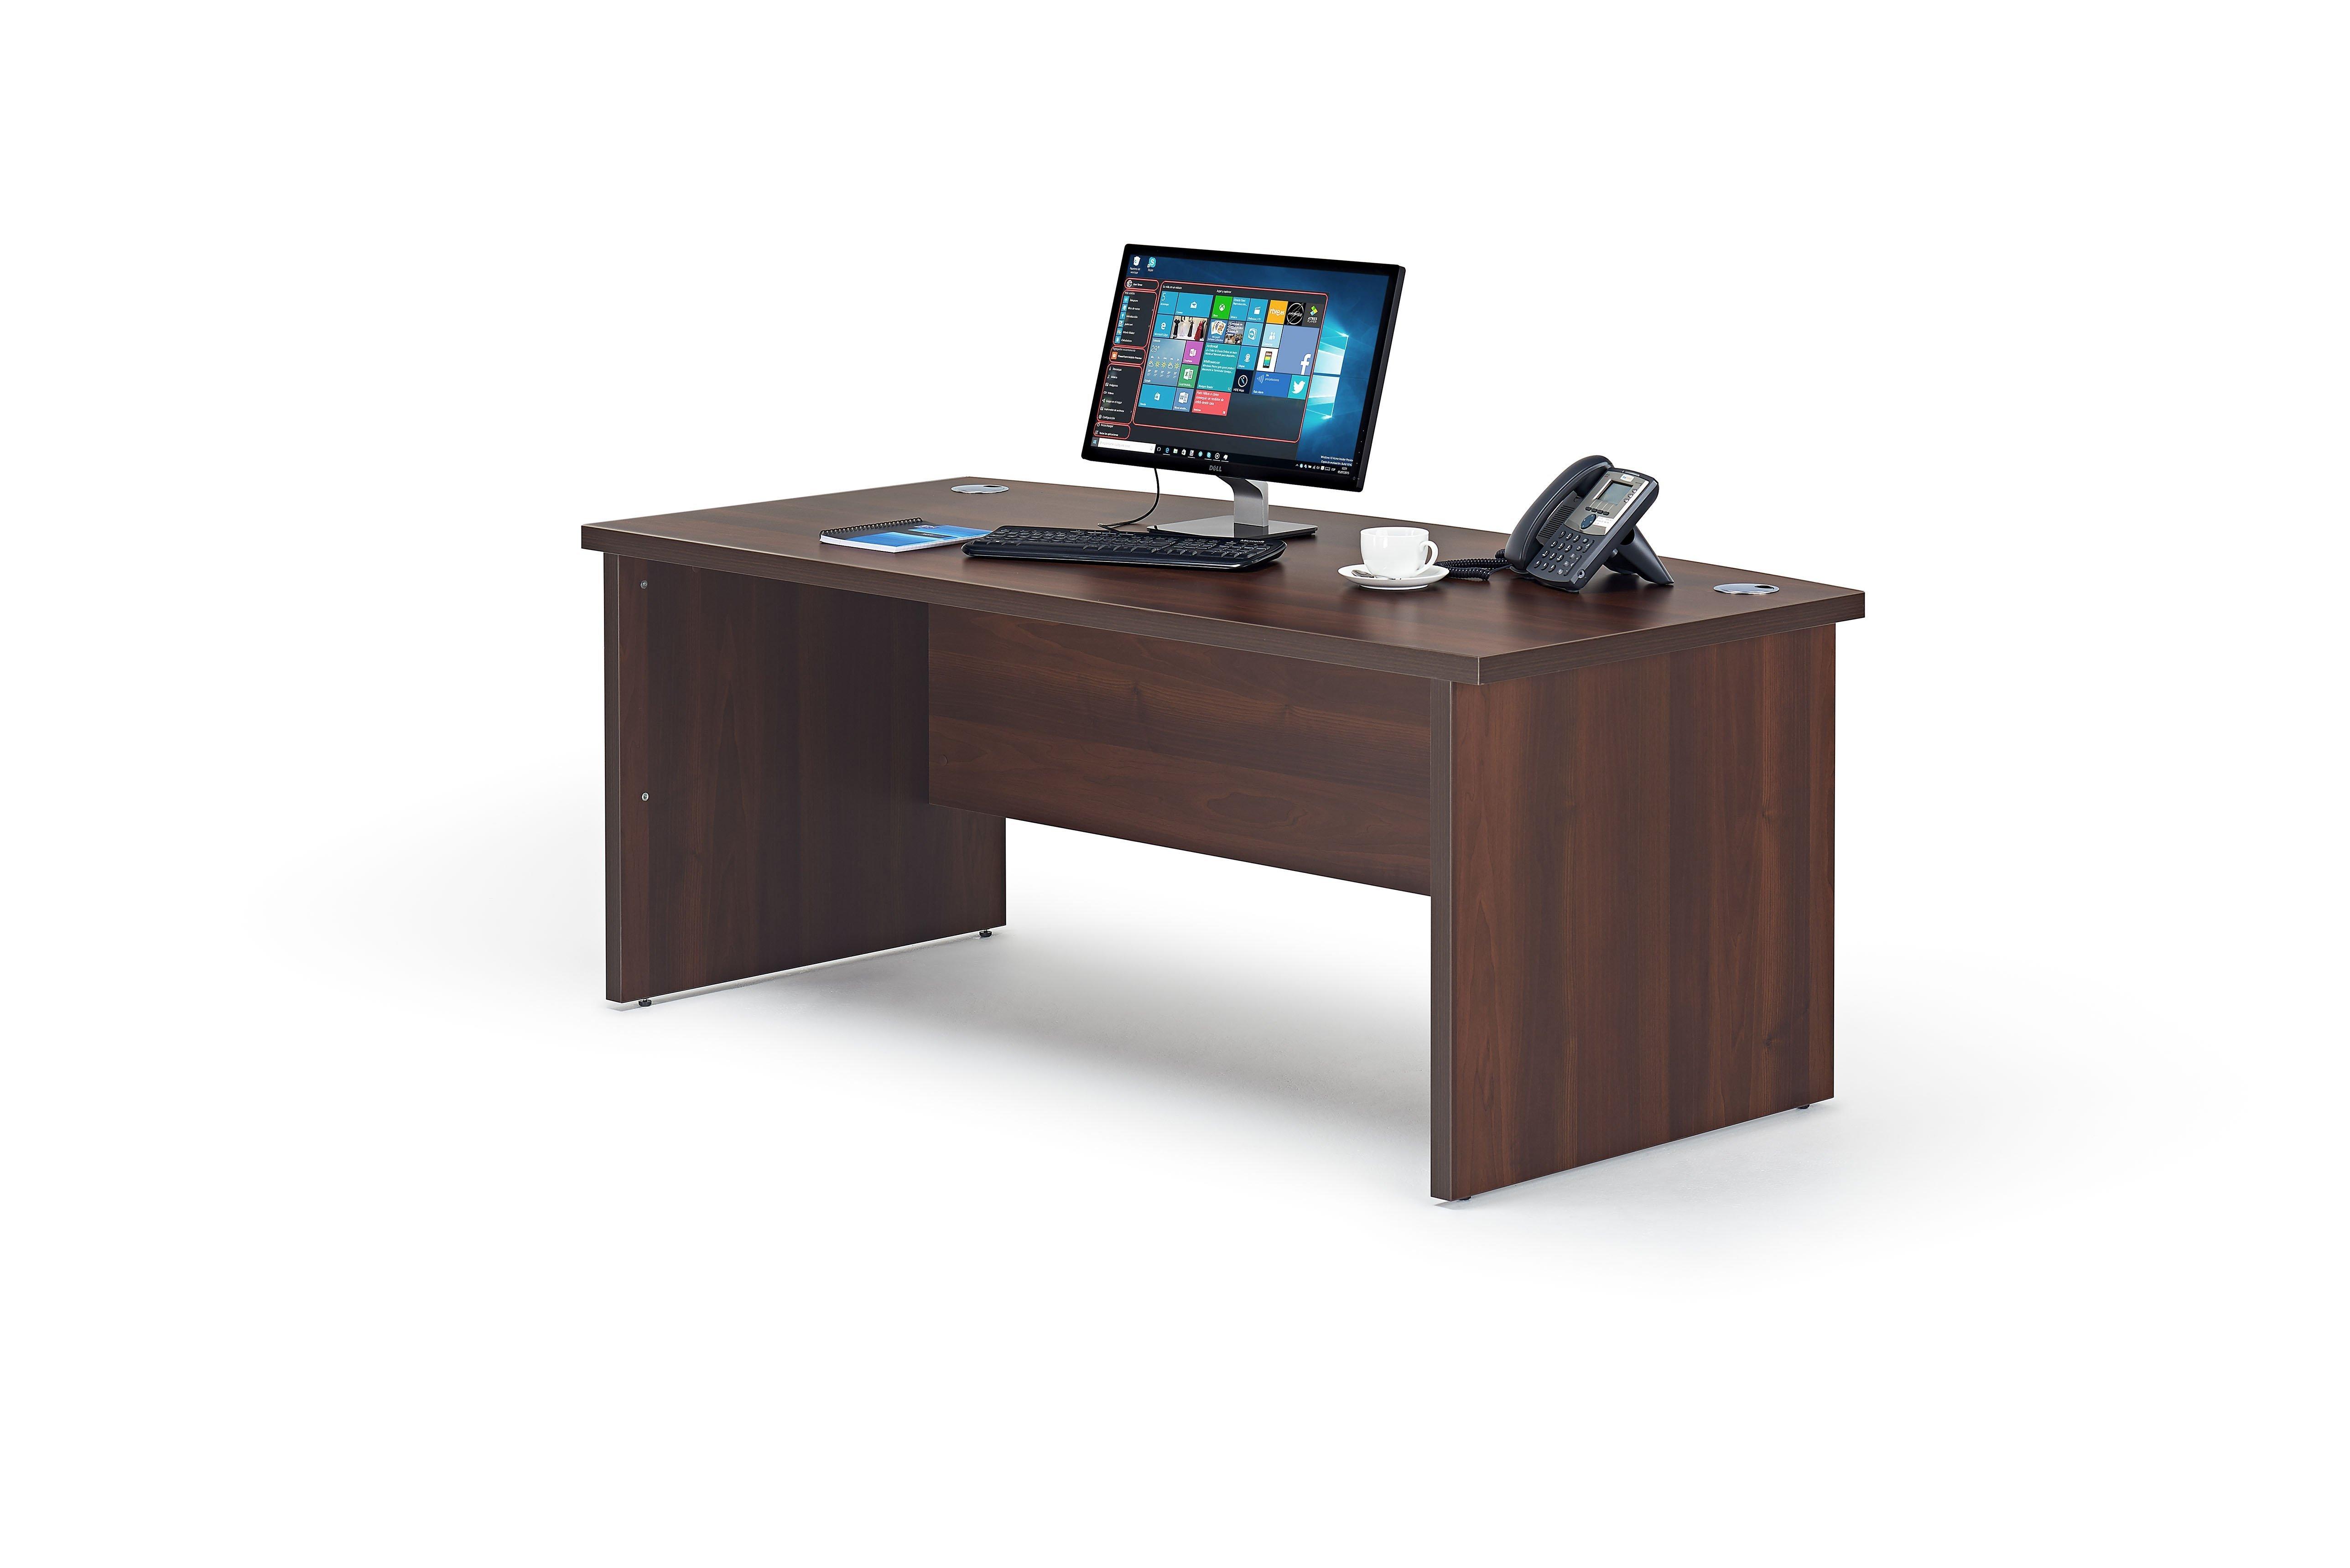 Premium Executive Walnut Finish Office Desk